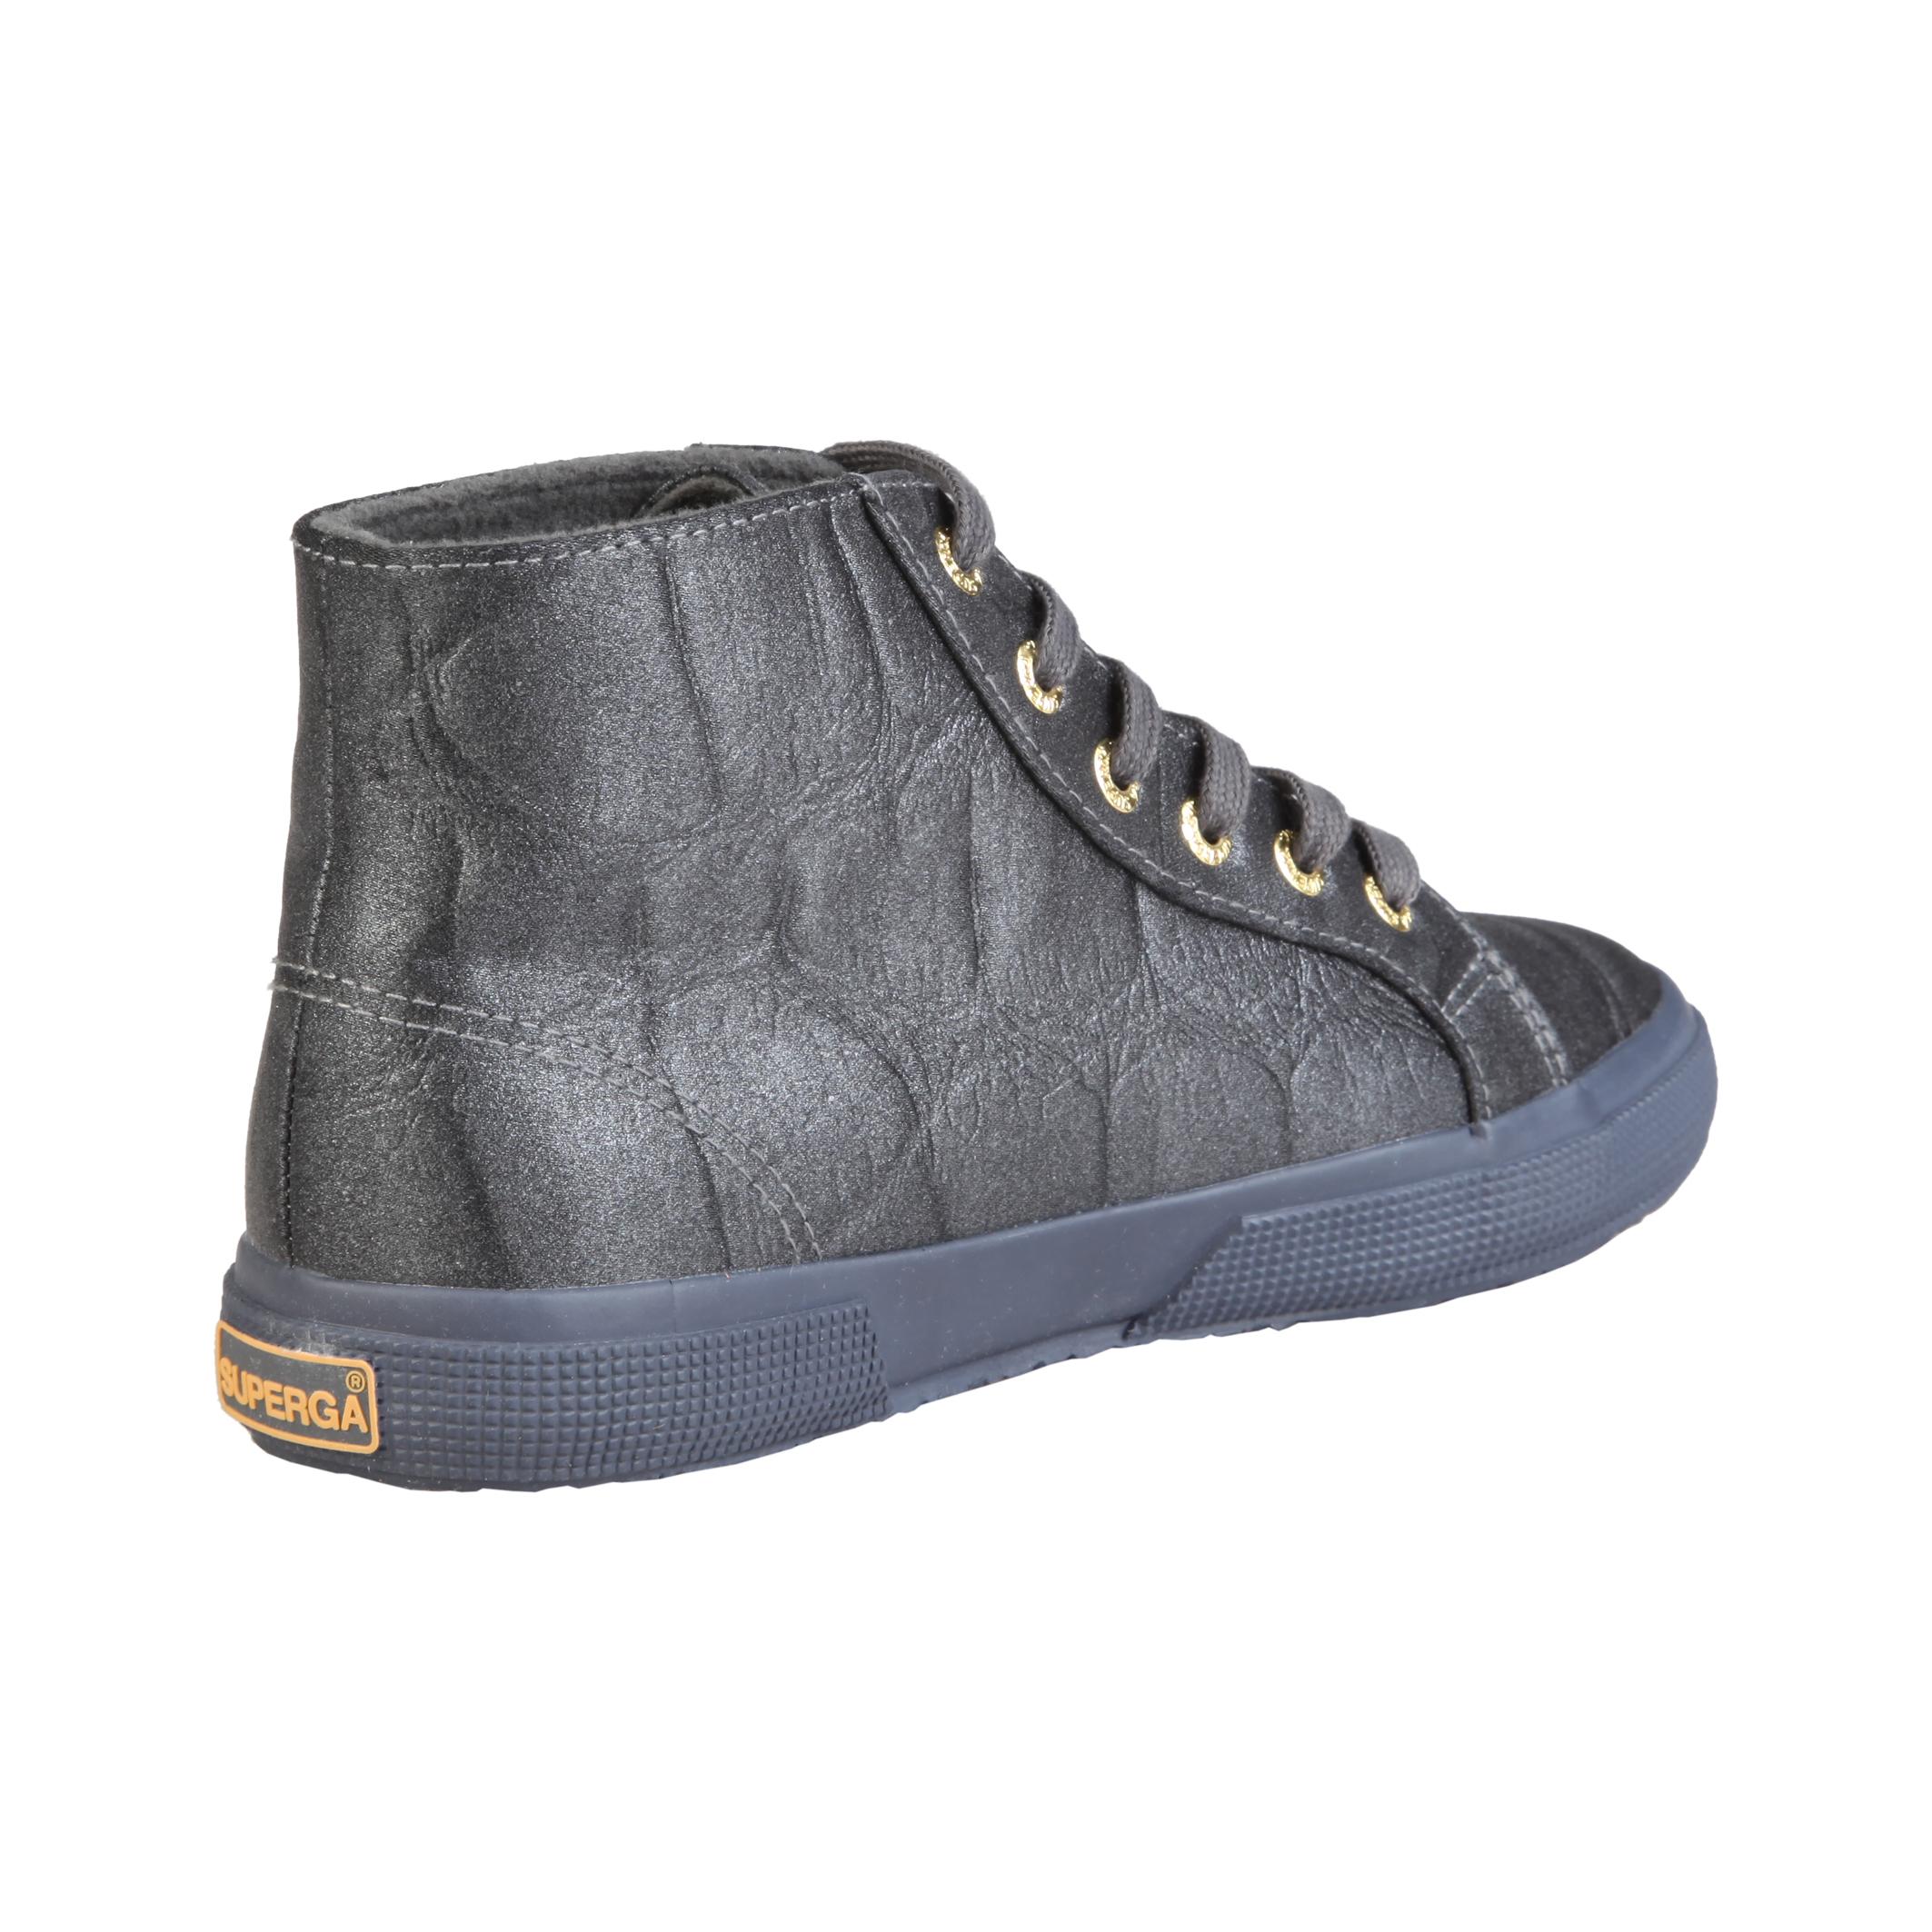 Scarpe-Superga-S009Y20-2095-Sneakers-Donna-Blu-Marrone-Verde-Autunno-Inverno